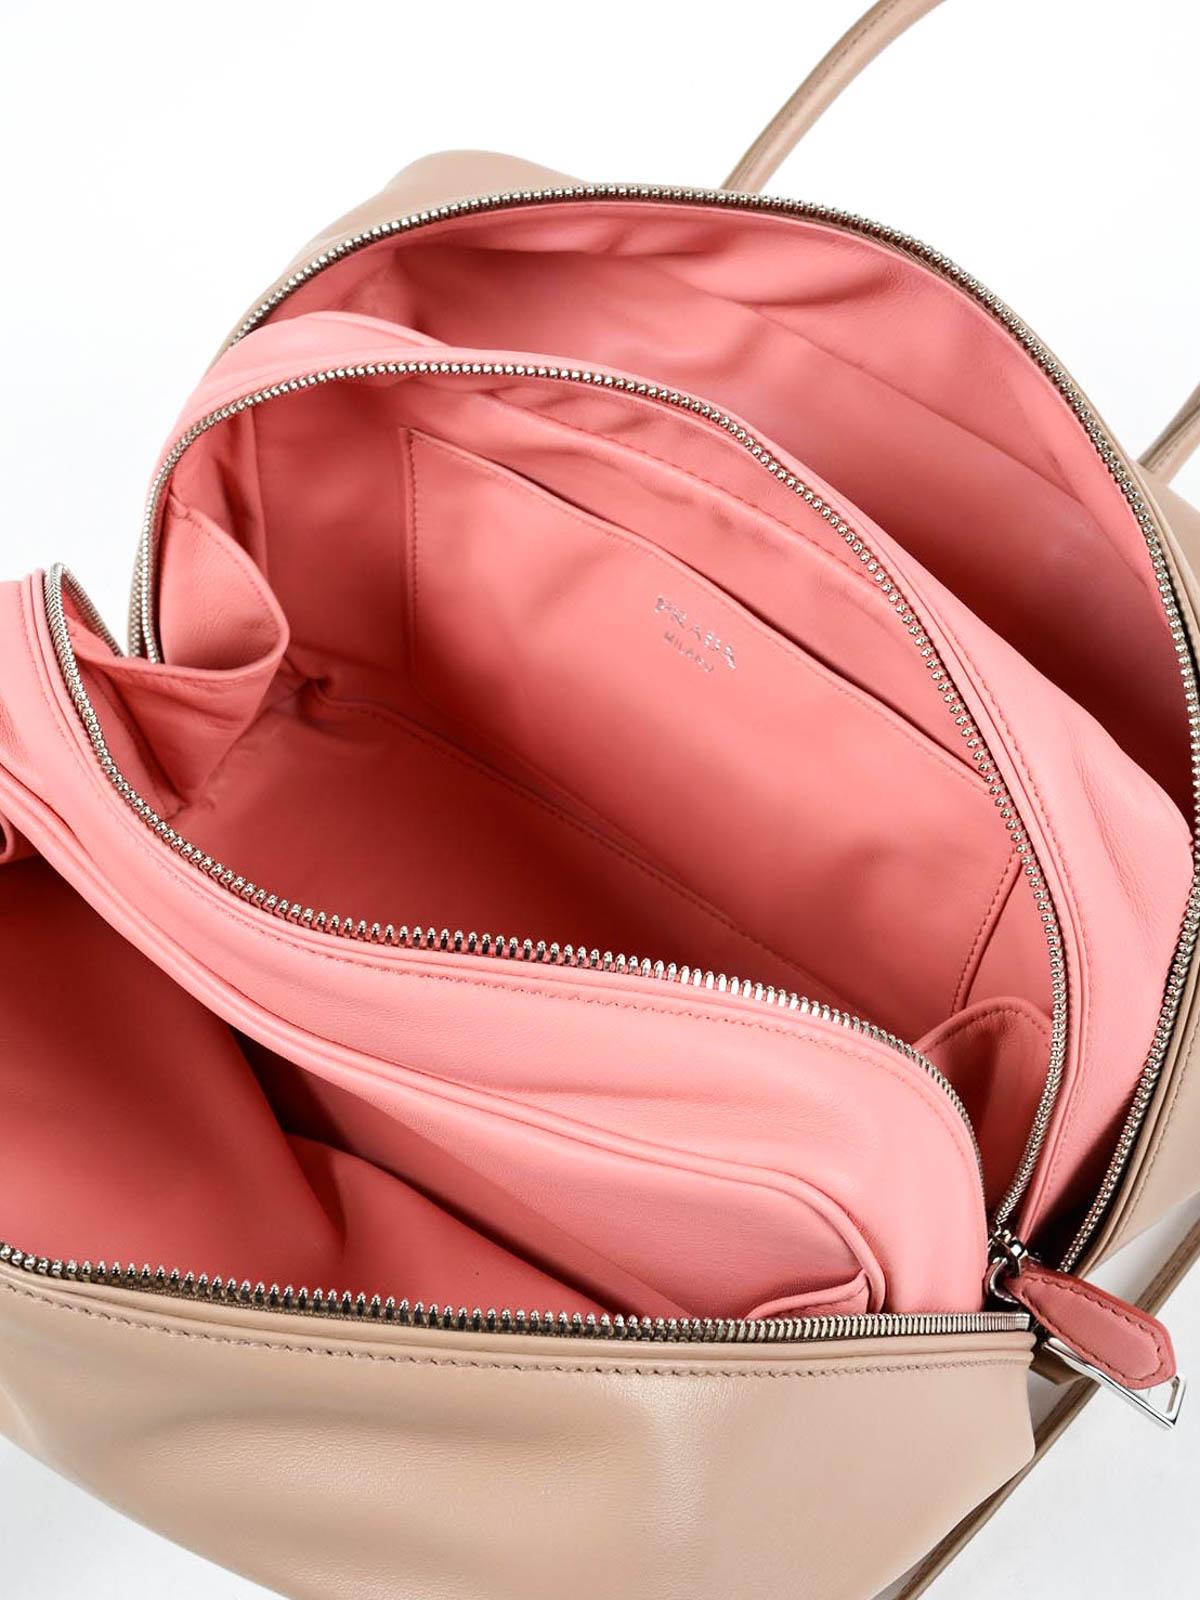 prada handbags price - Inside soft leather bag by Prada - bowling bags | iKRIX